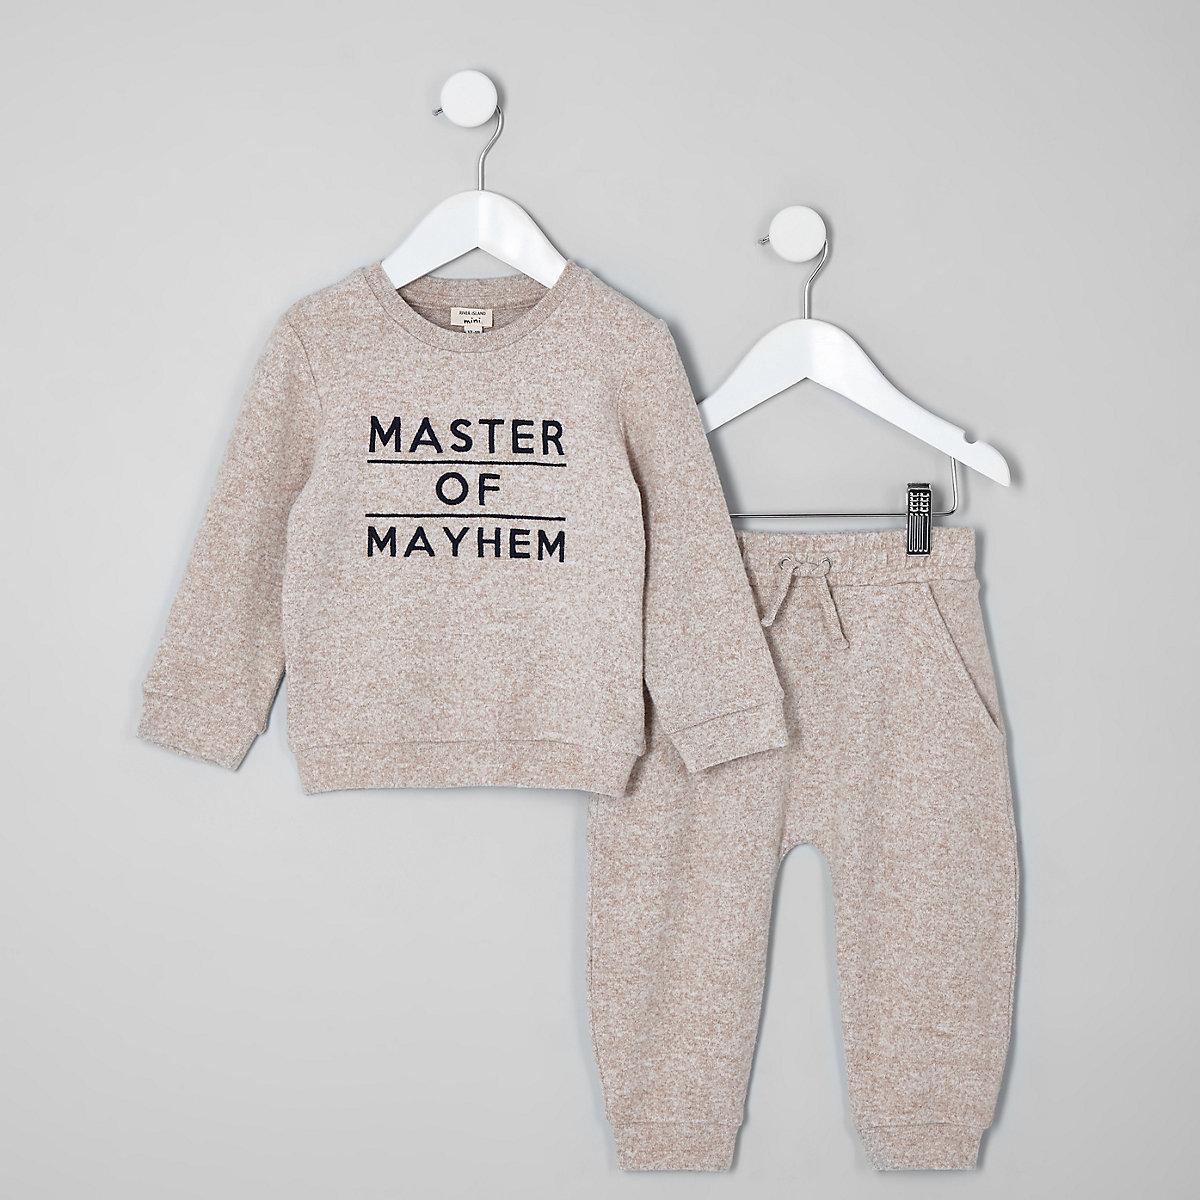 Mini boys grey 'master of mayhem' outfit